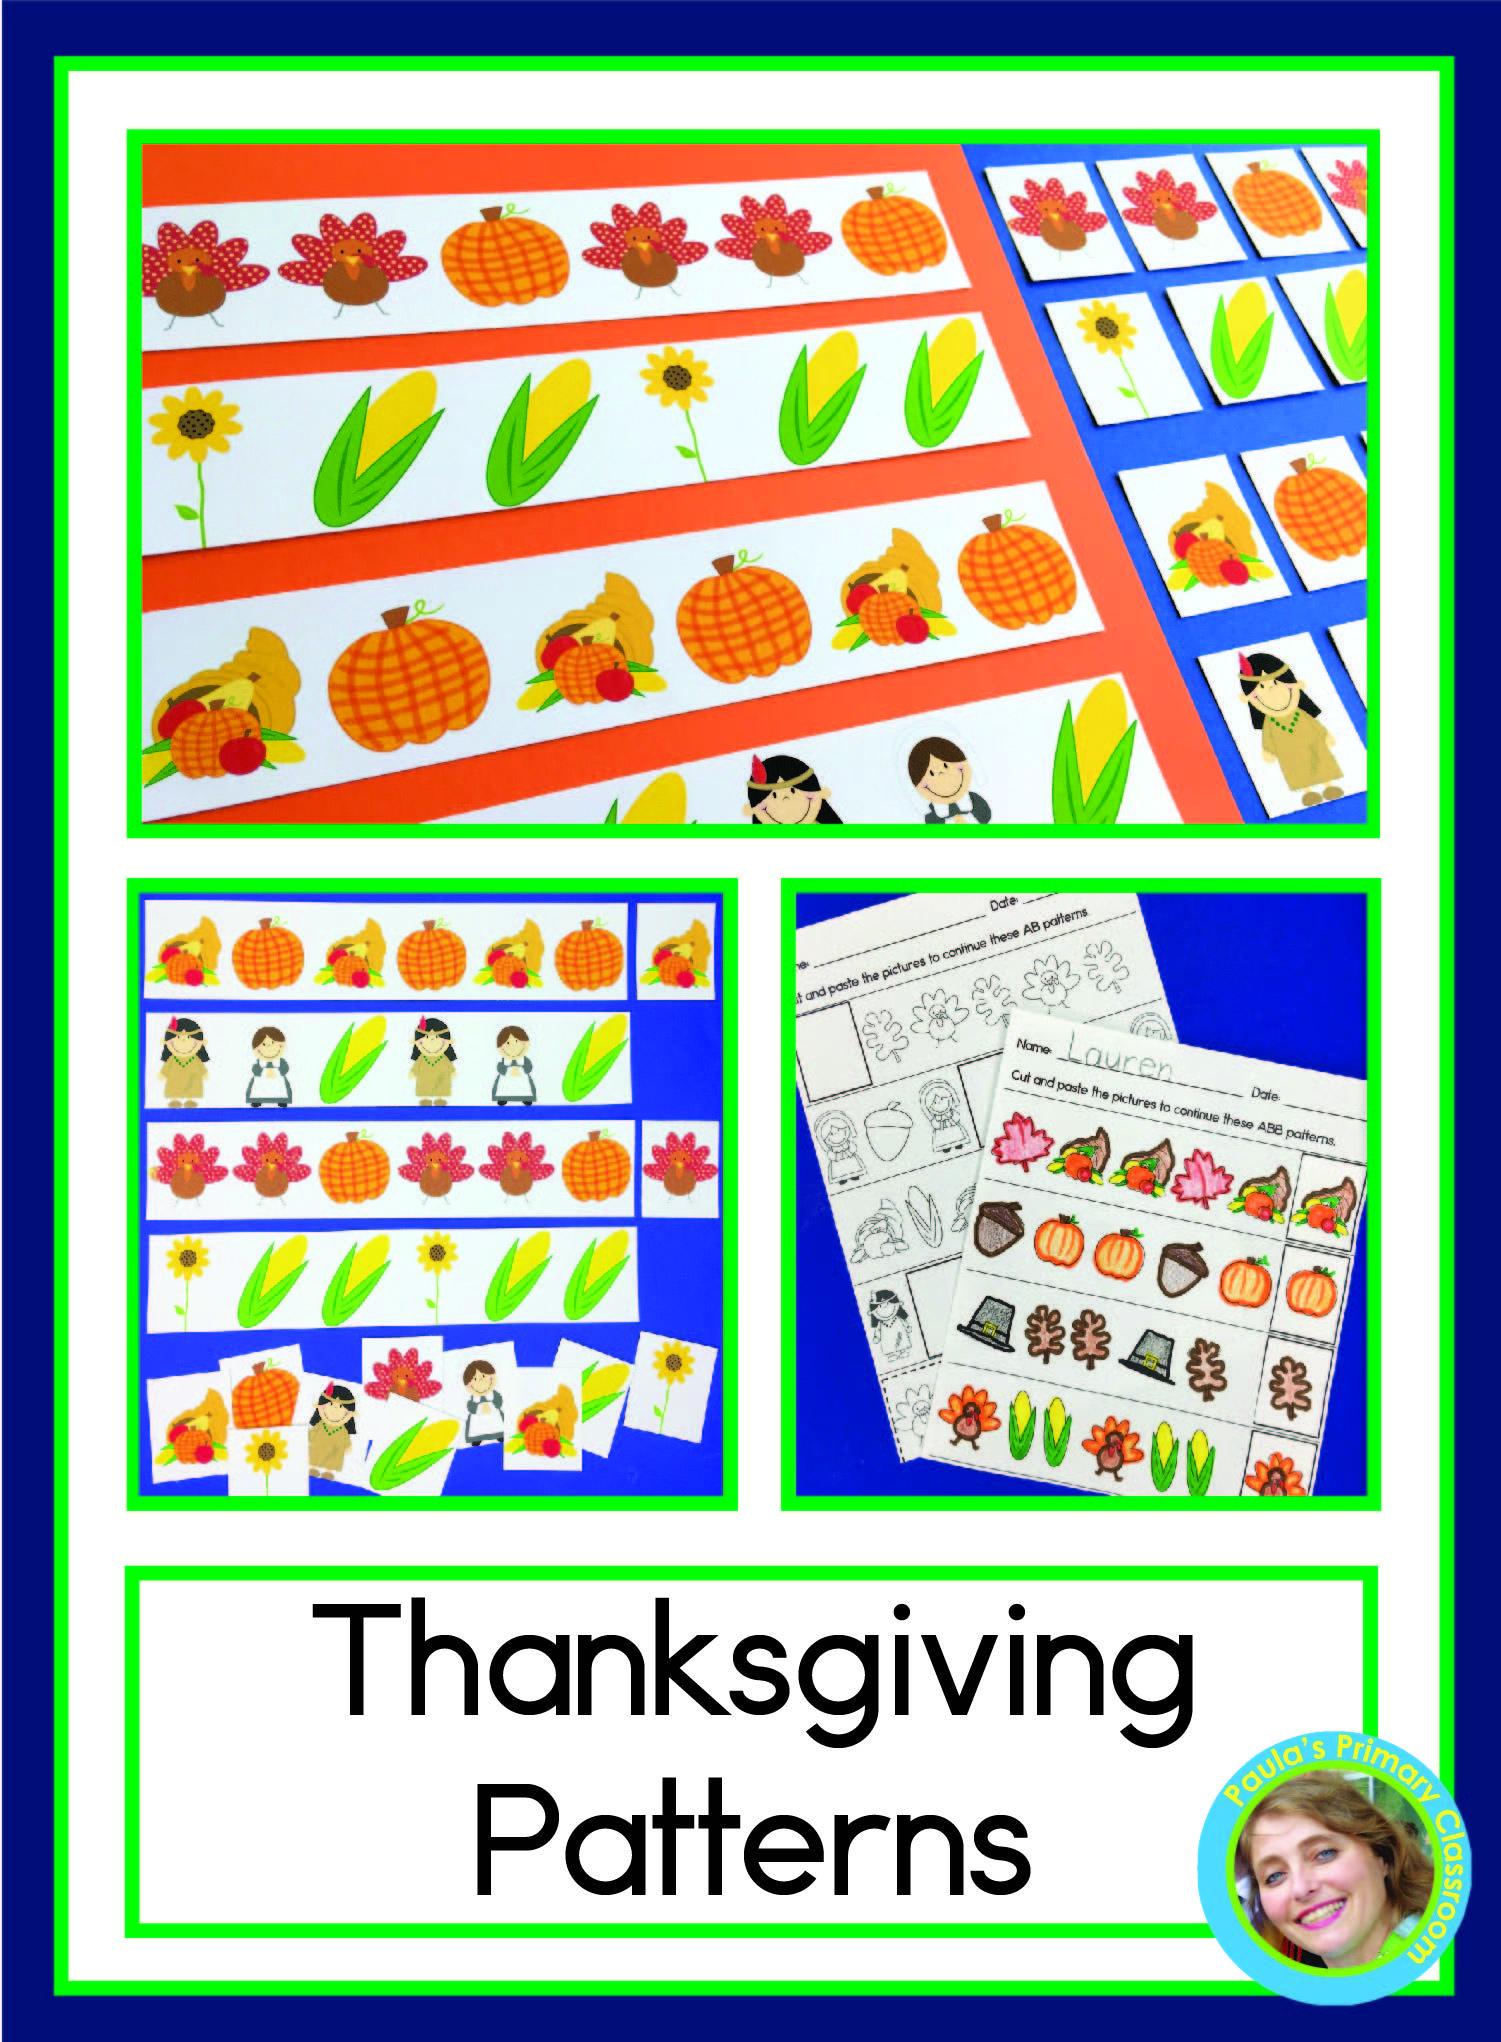 Thanksgiving Patterns With Pilgrims